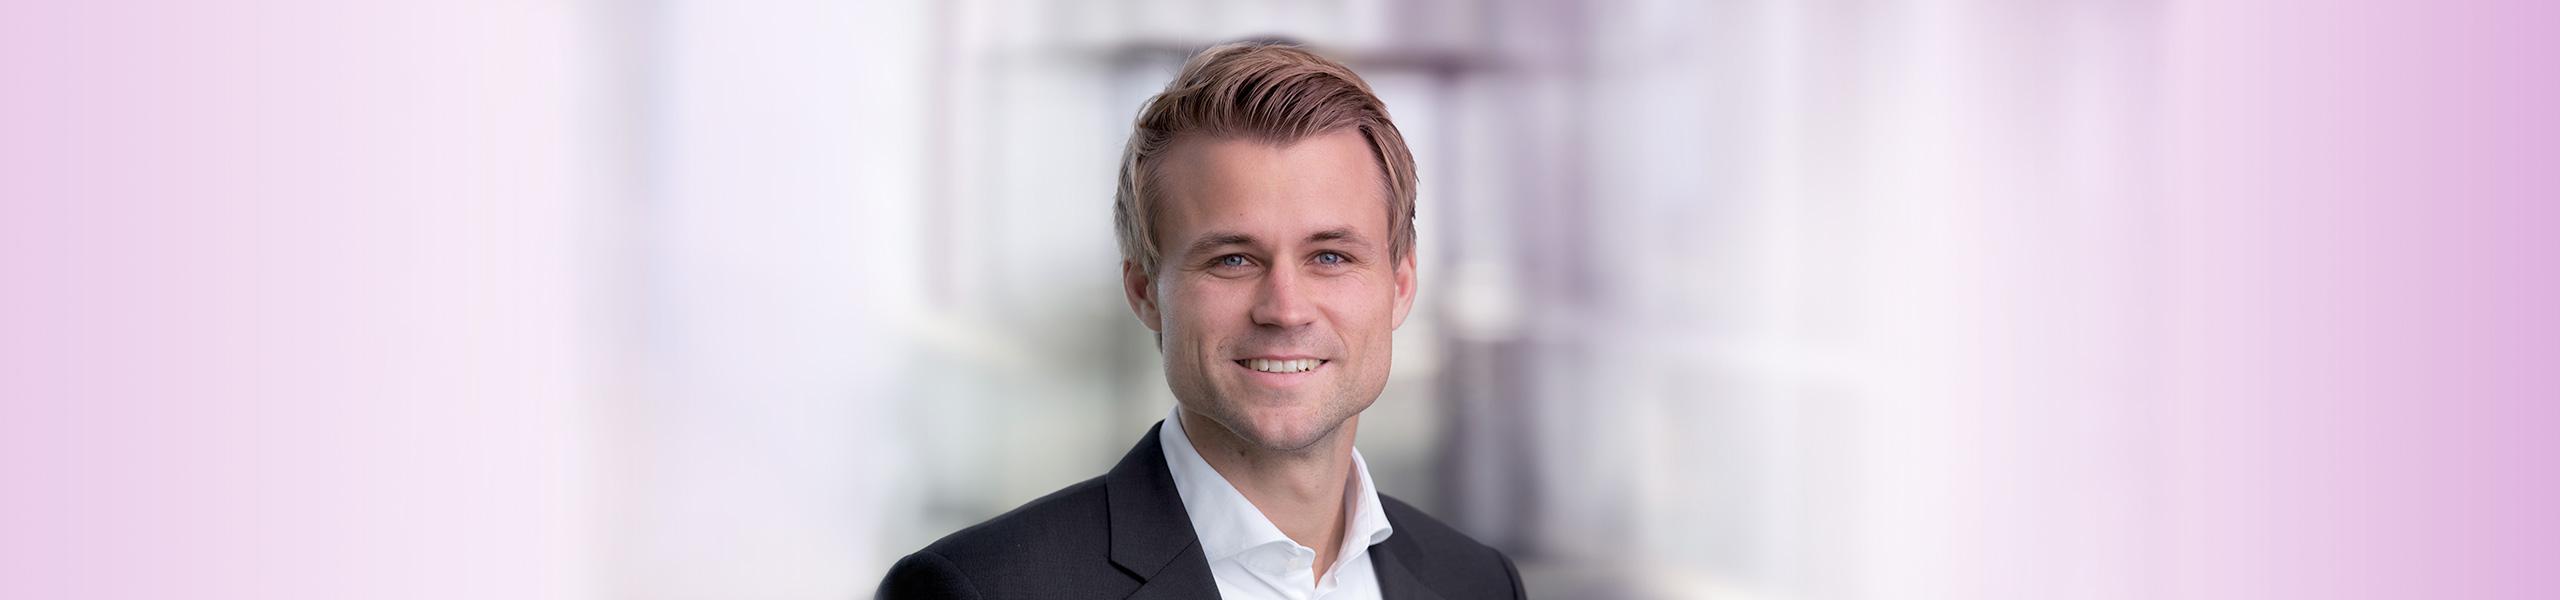 Thilo Städtler Consultant